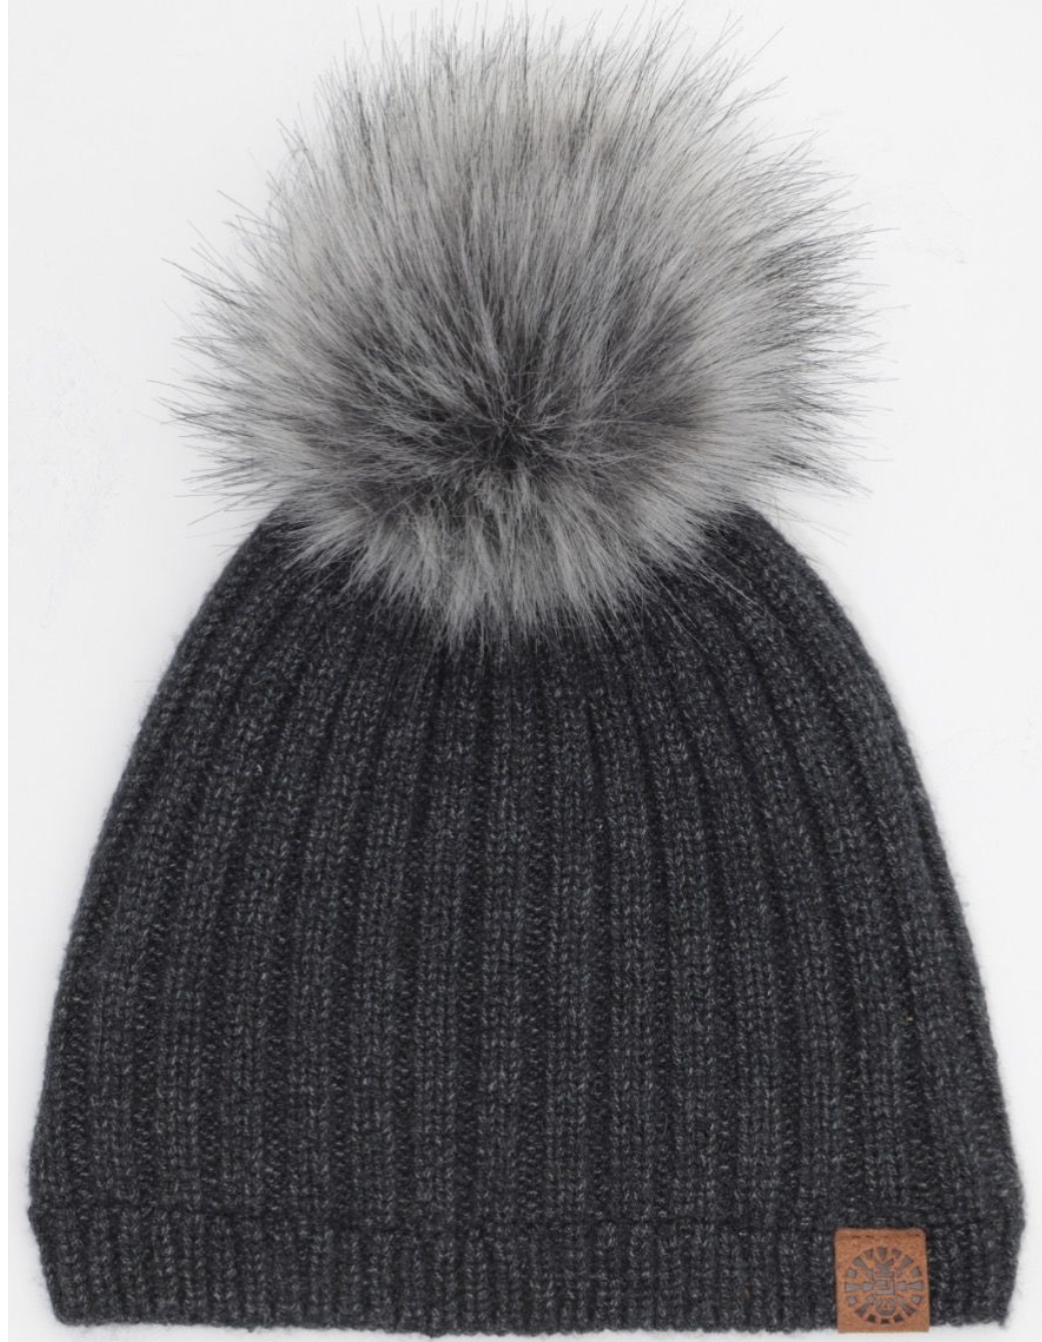 Calikids Infant (9-24 mos) Knit Hat